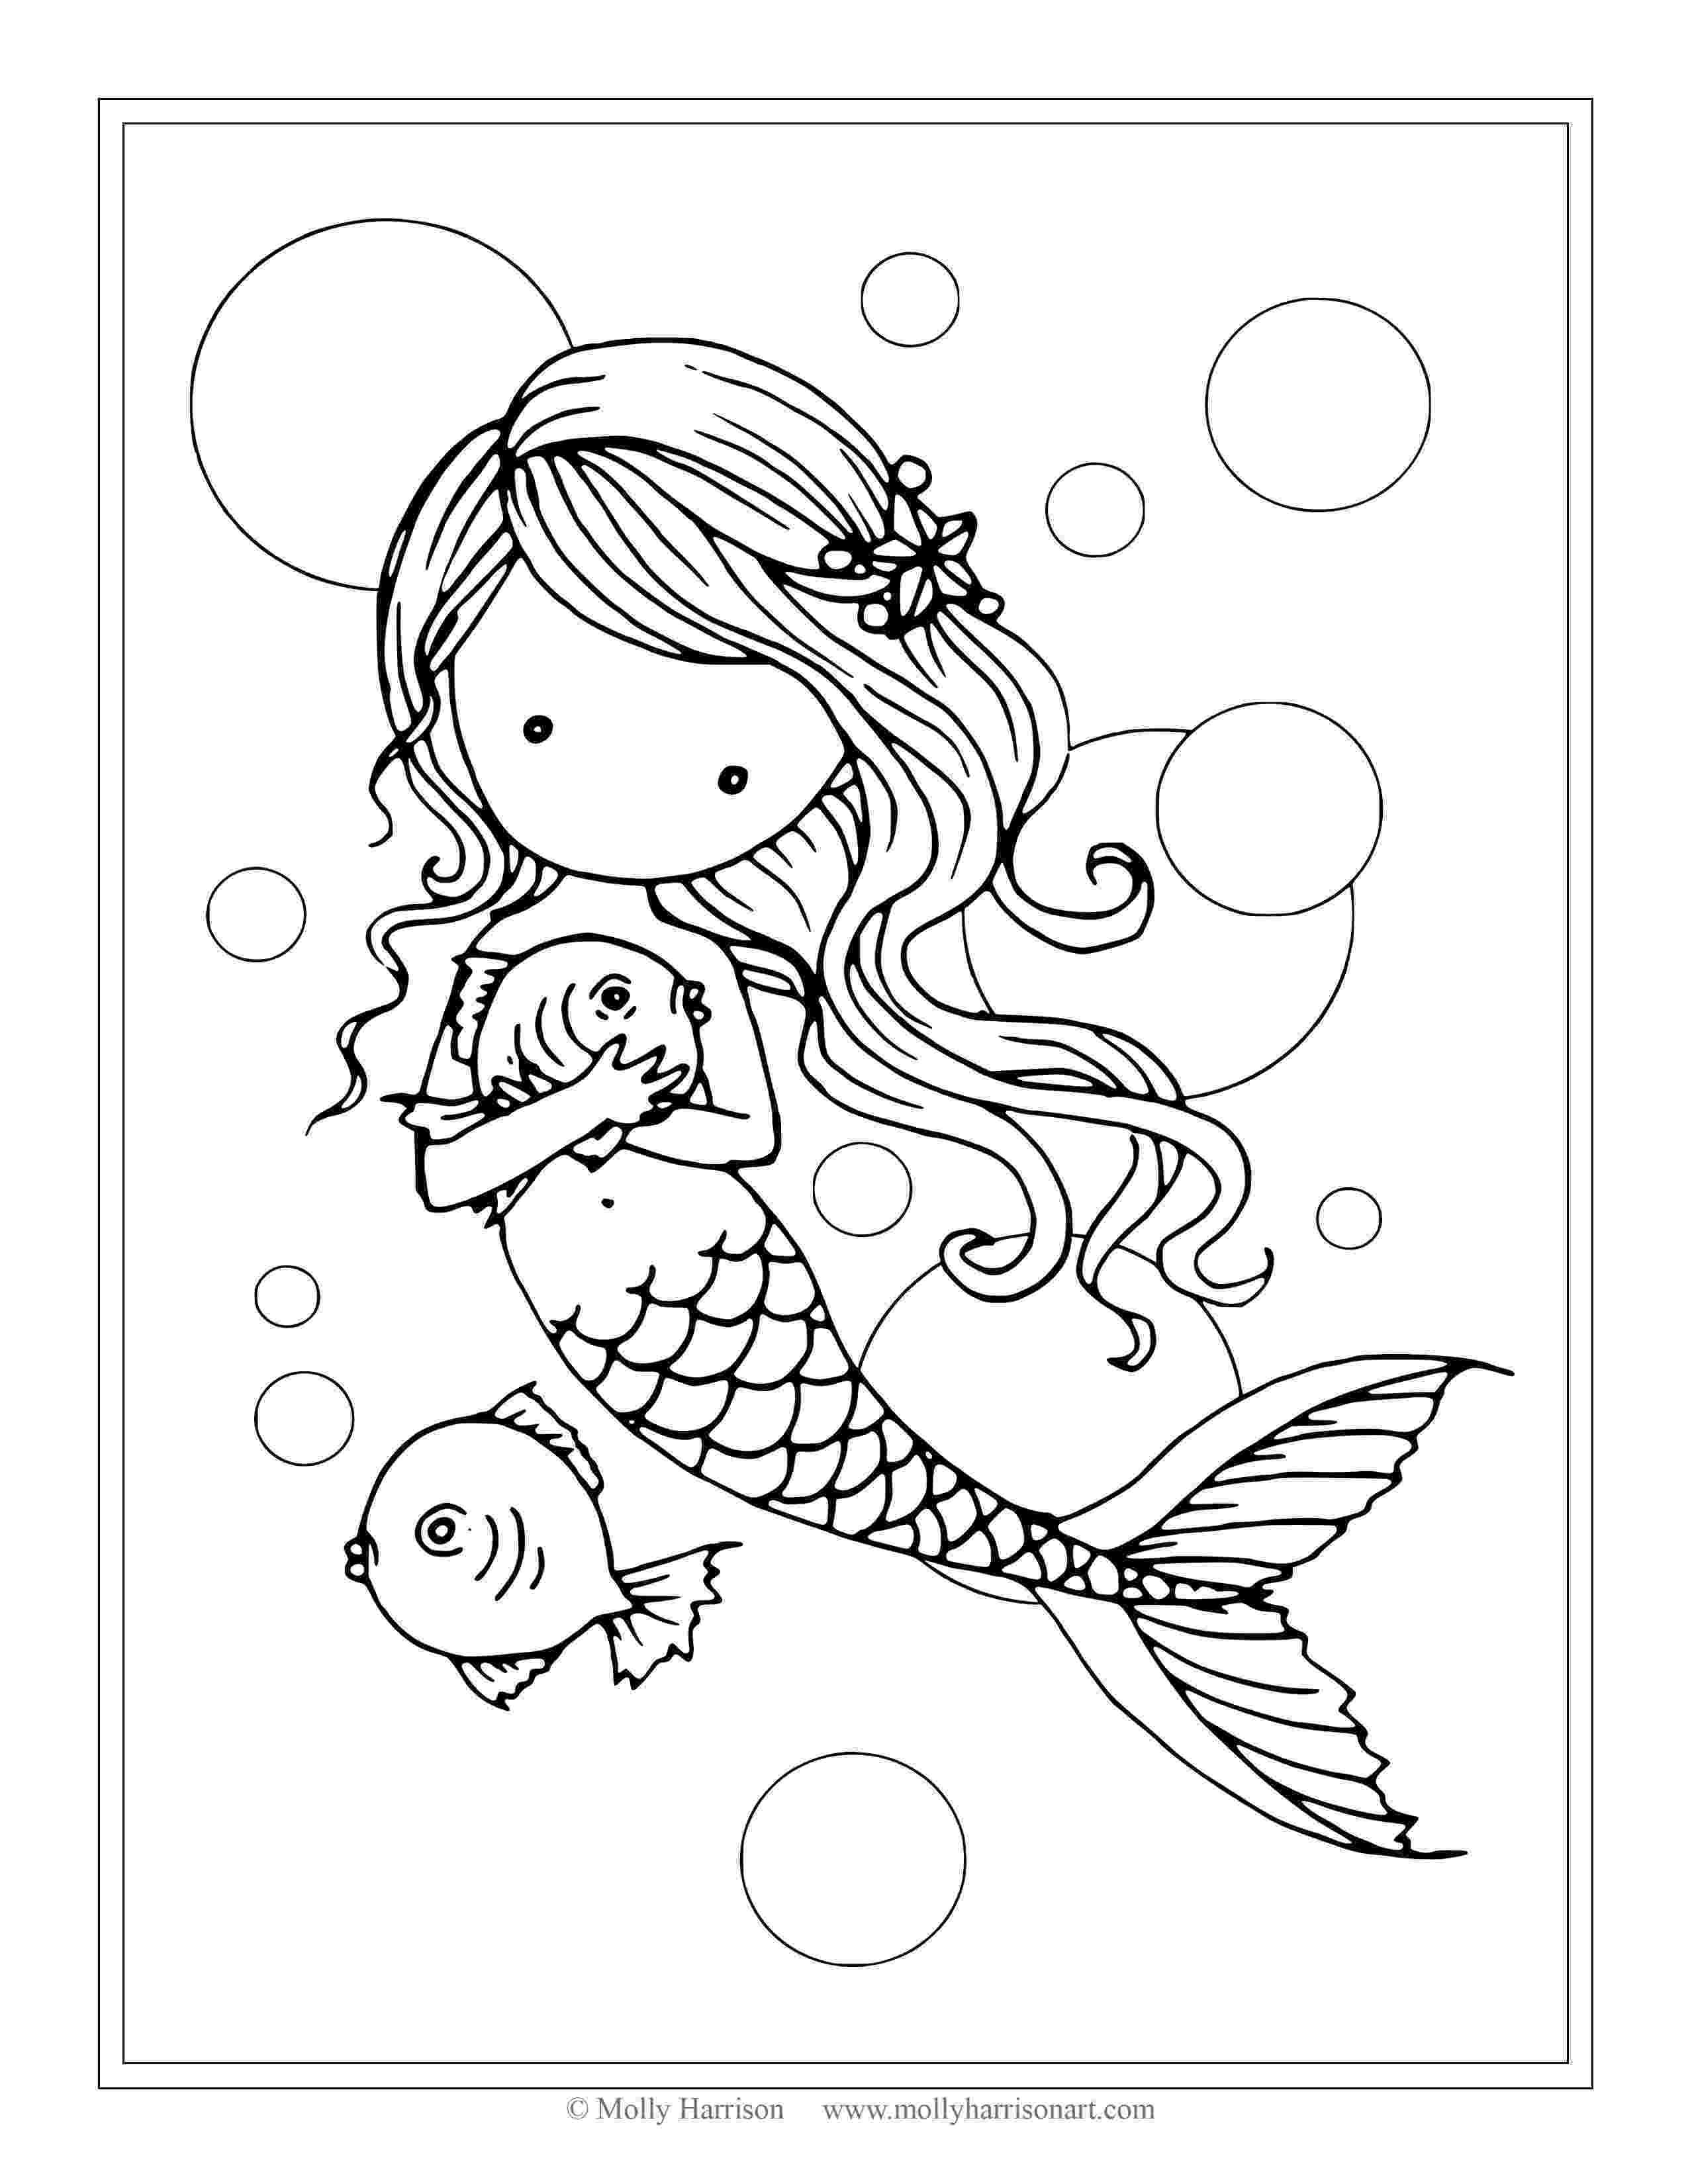 free mermaid coloring pages mermaid barbie colouring pages mermaid coloring mermaid mermaid free pages coloring